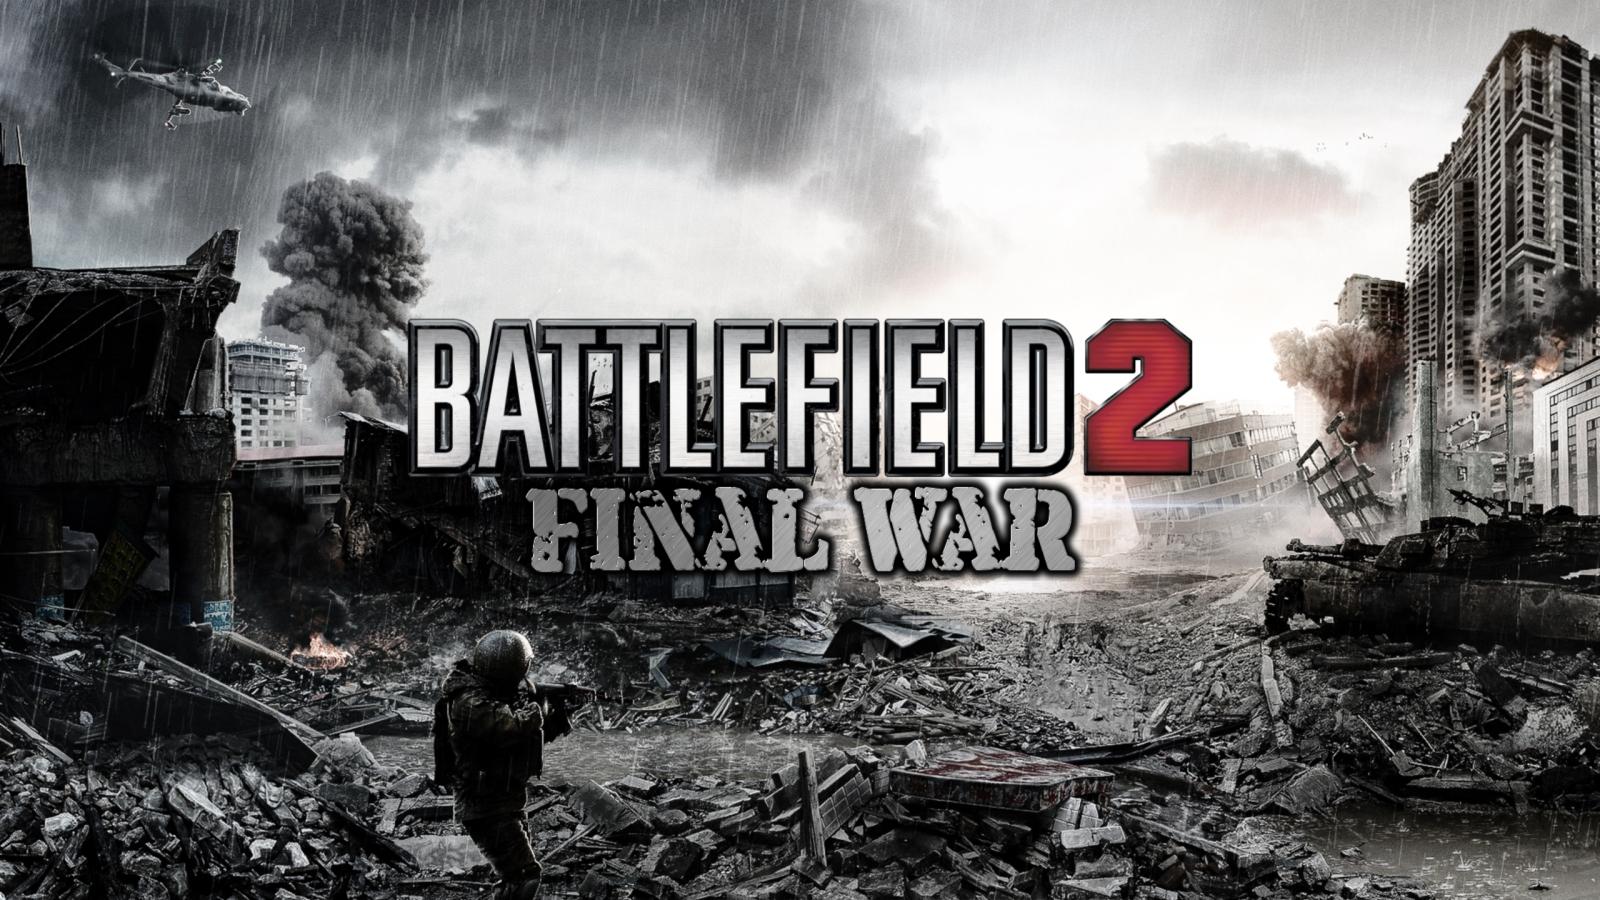 battlefield 2: final war mod - mod db